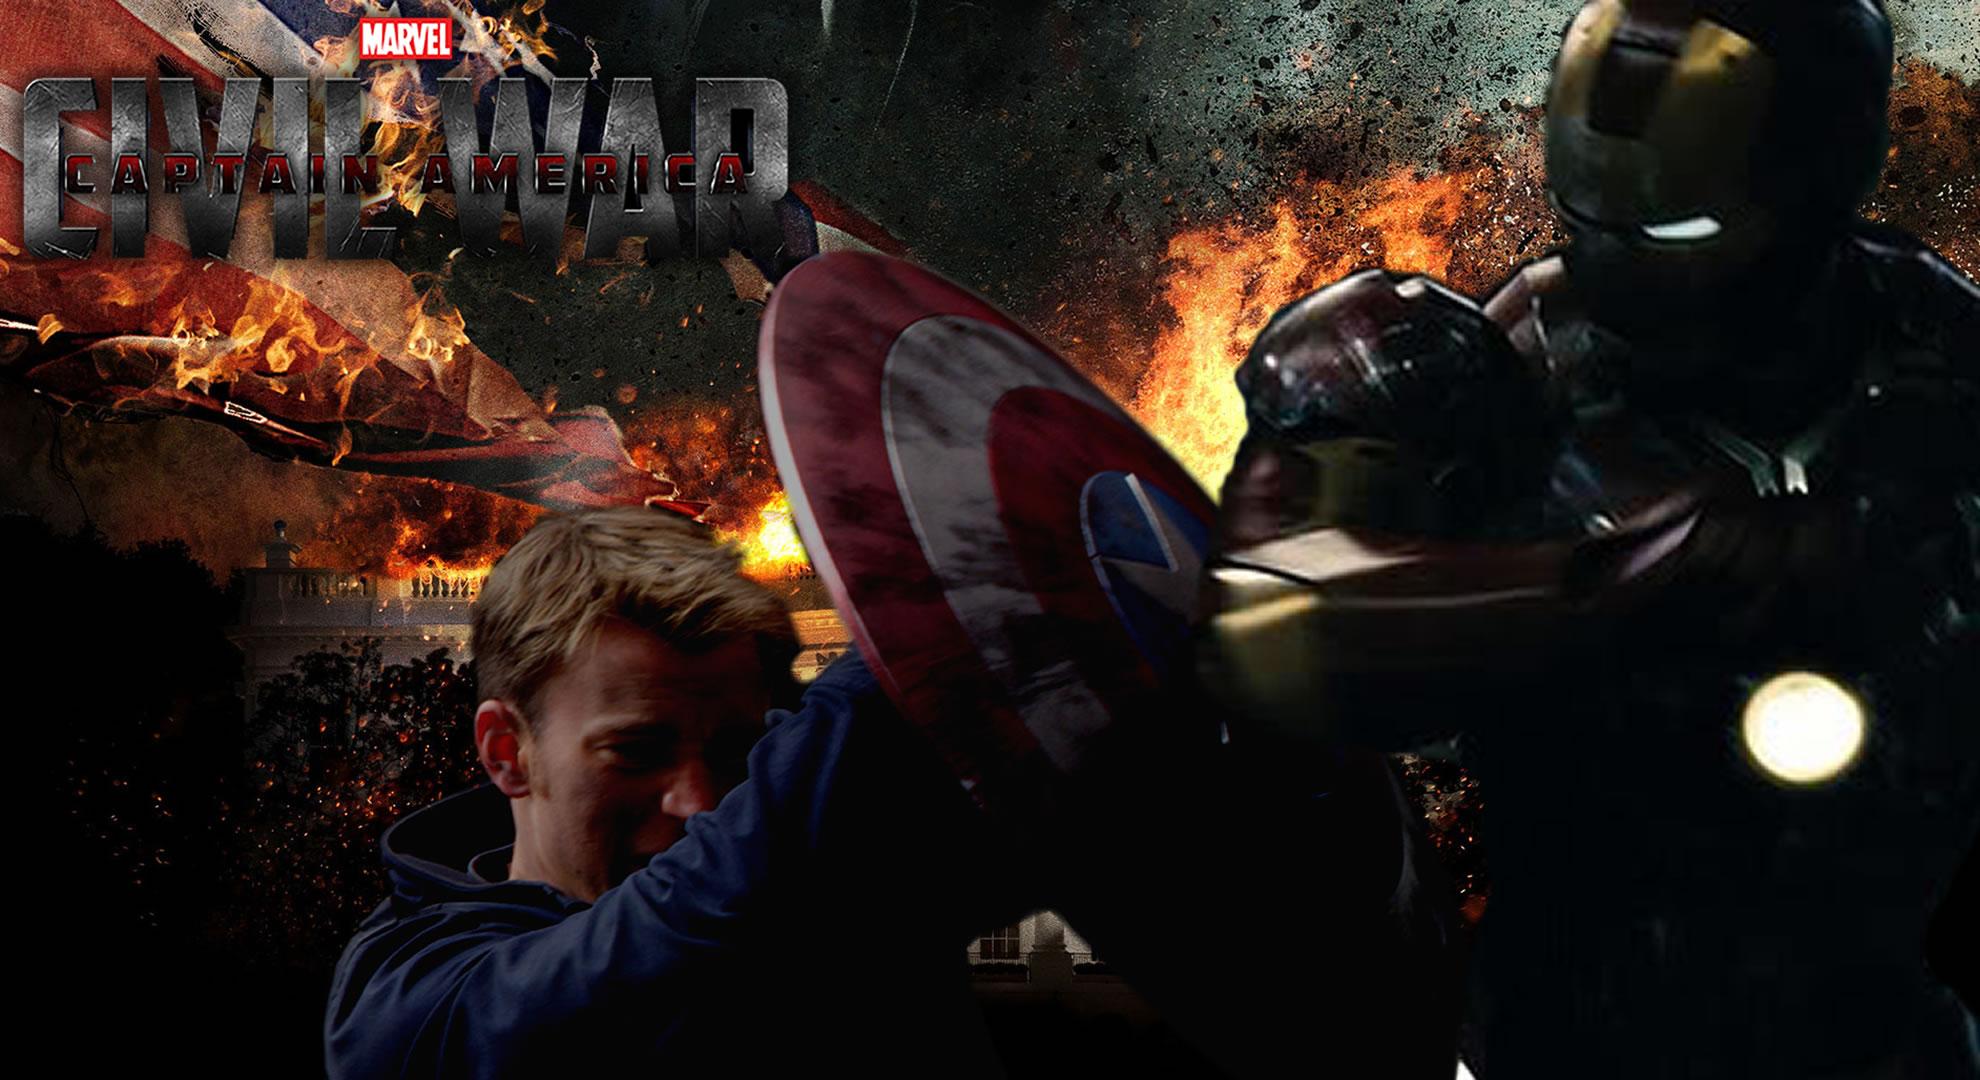 Captain America Civil War Wallpaper   Galaxy Wallpaper HD 1980x1080